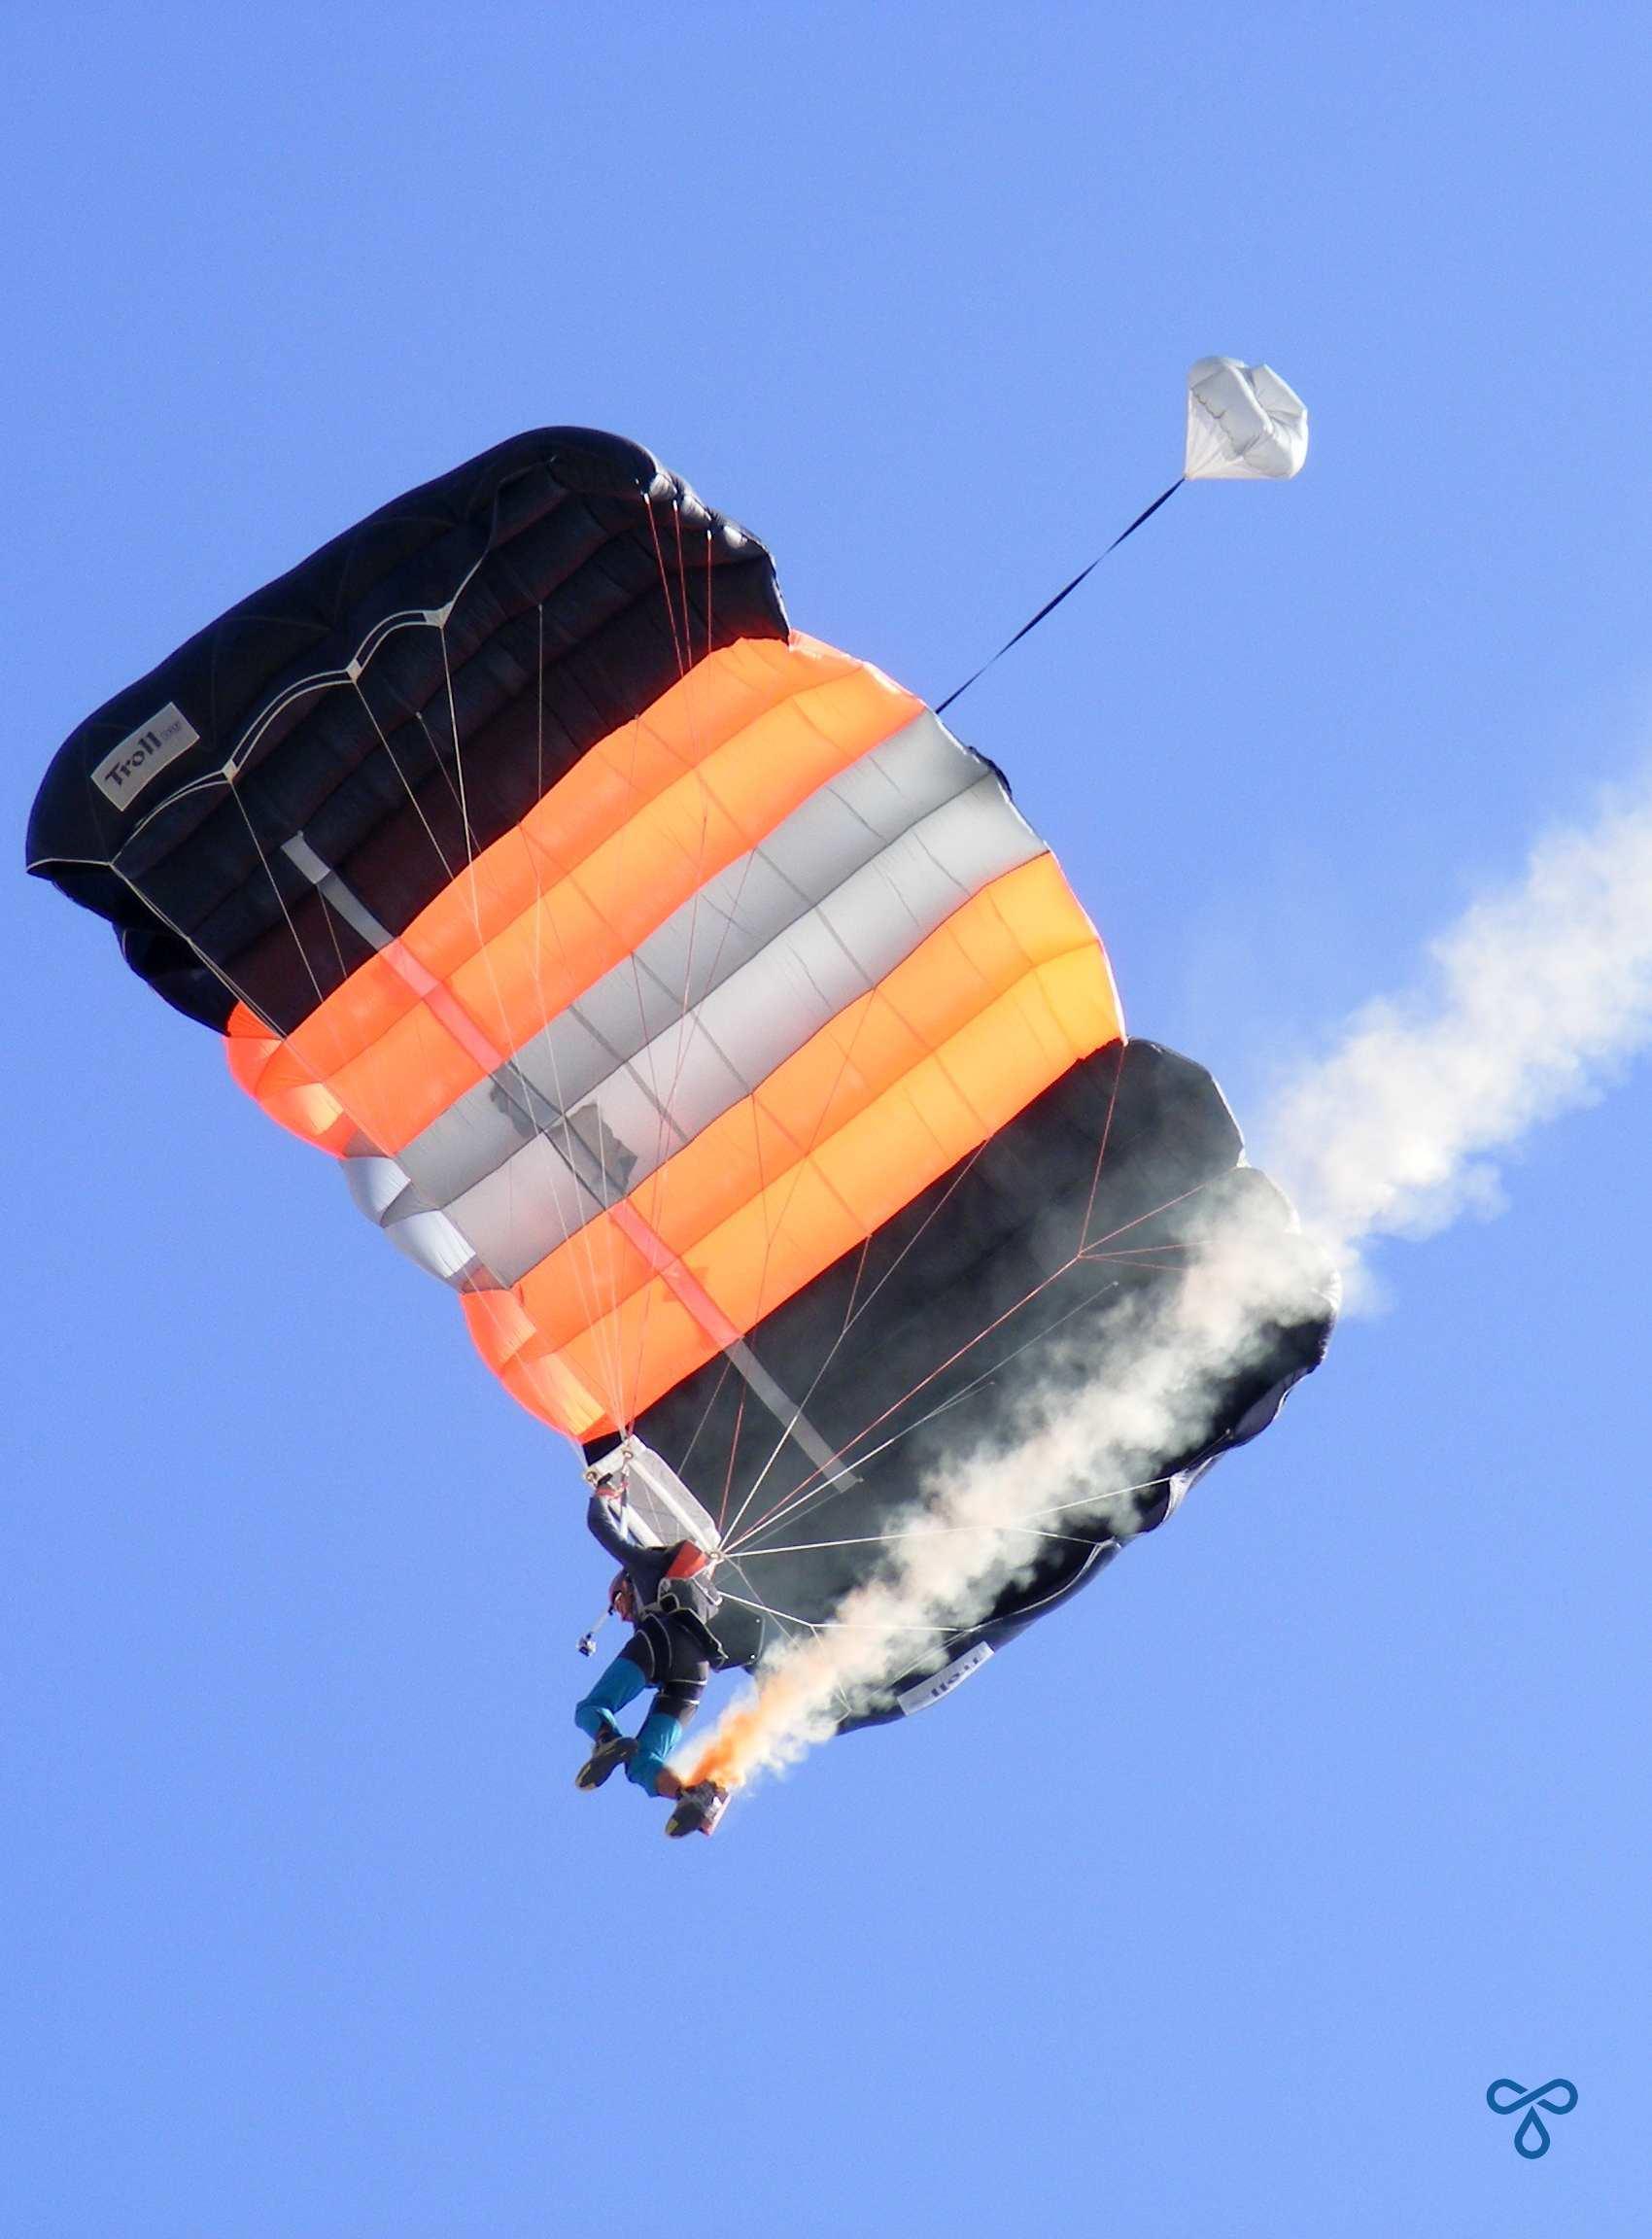 Ölüdeniz Air Games Skydiver